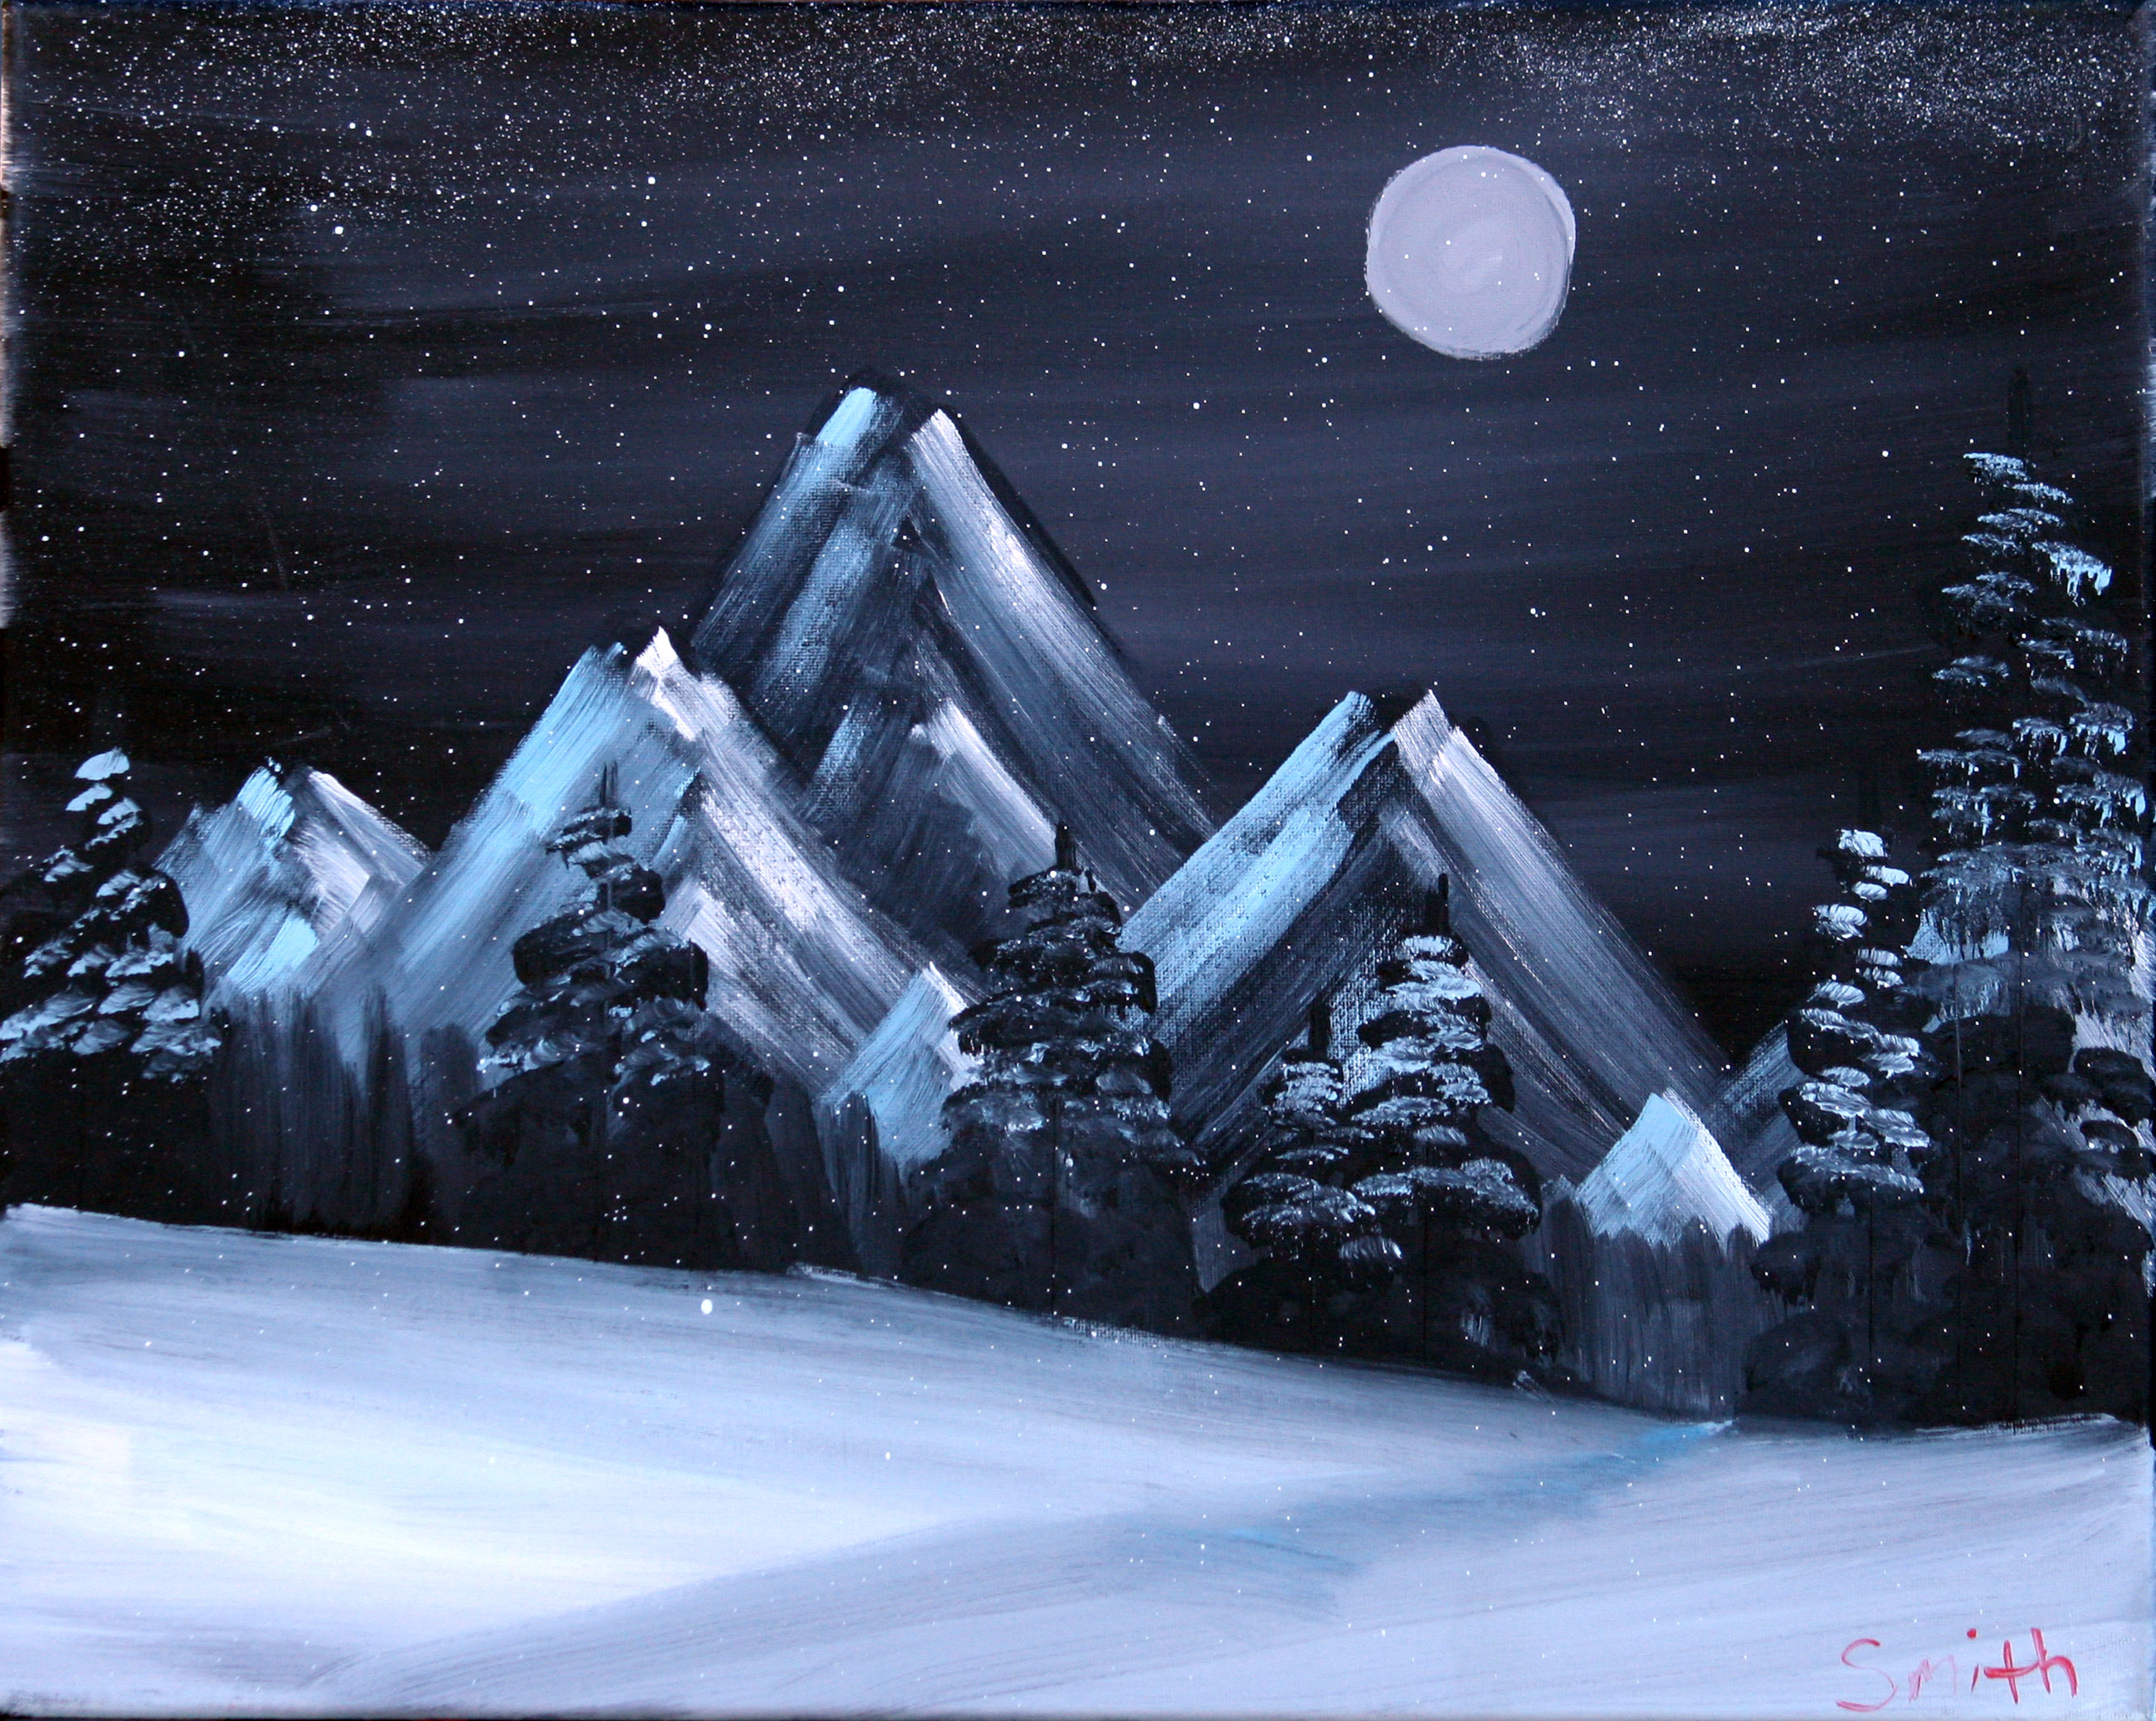 Nighttime-Winter-Mountains